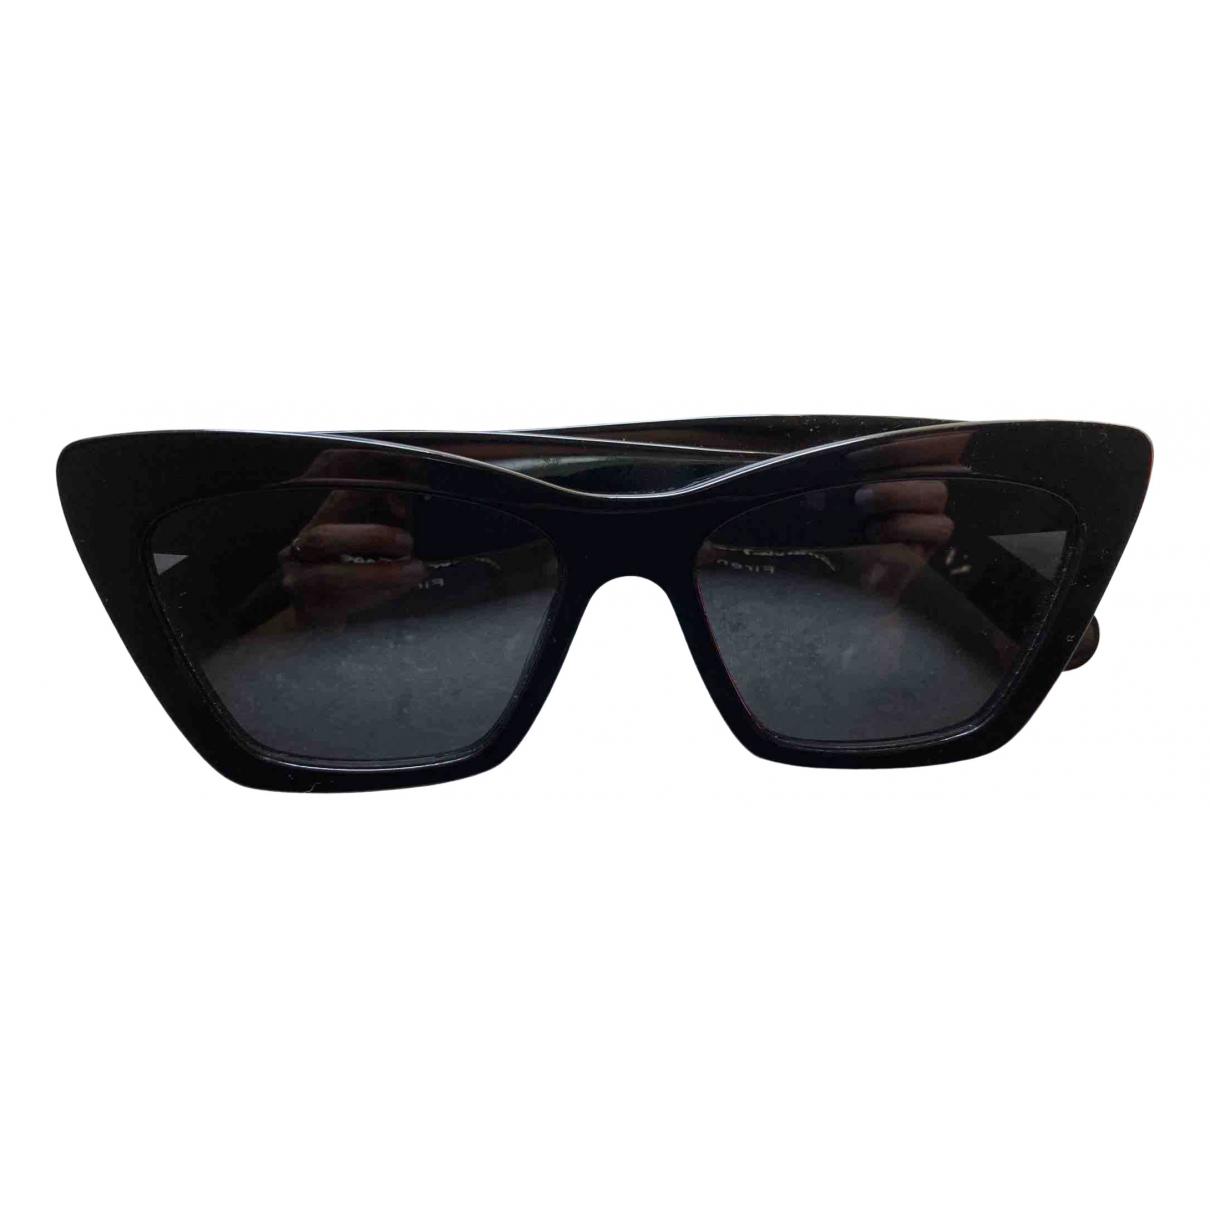 Salvatore Ferragamo \N Black Sunglasses for Women \N